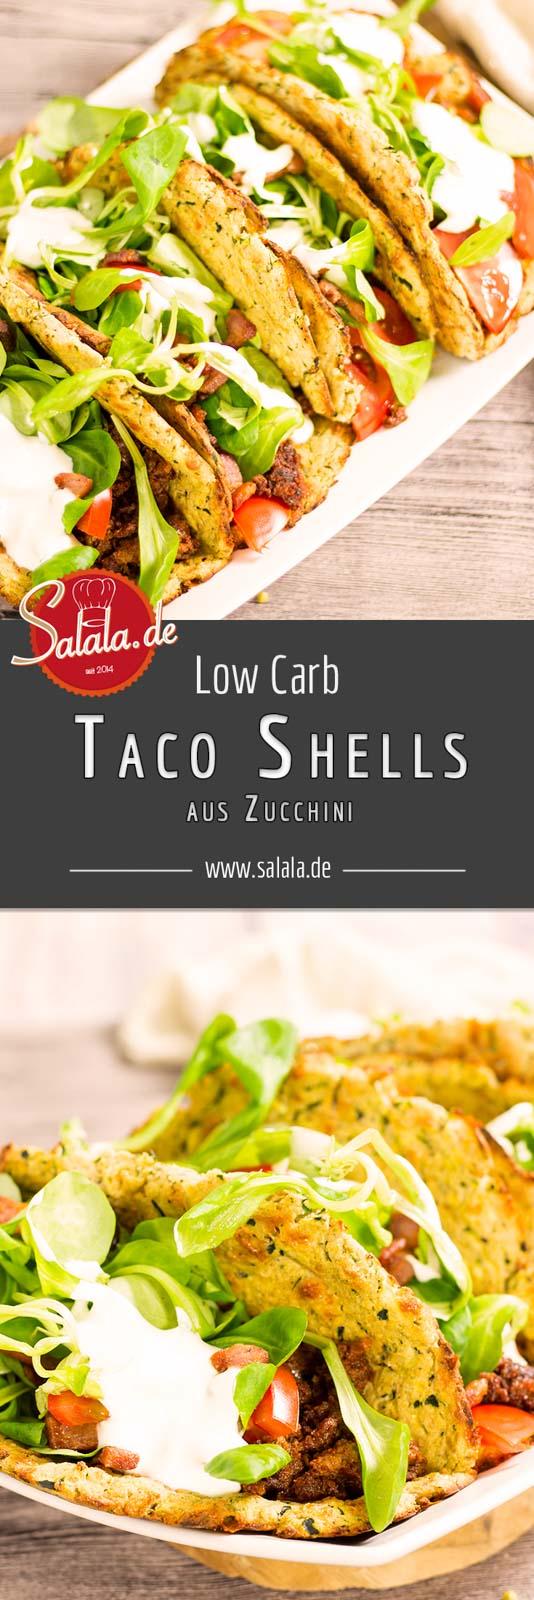 Zucchini Taco Shells - by salala.de - Rezept ohne Mehl Low Carb selbst gemacht